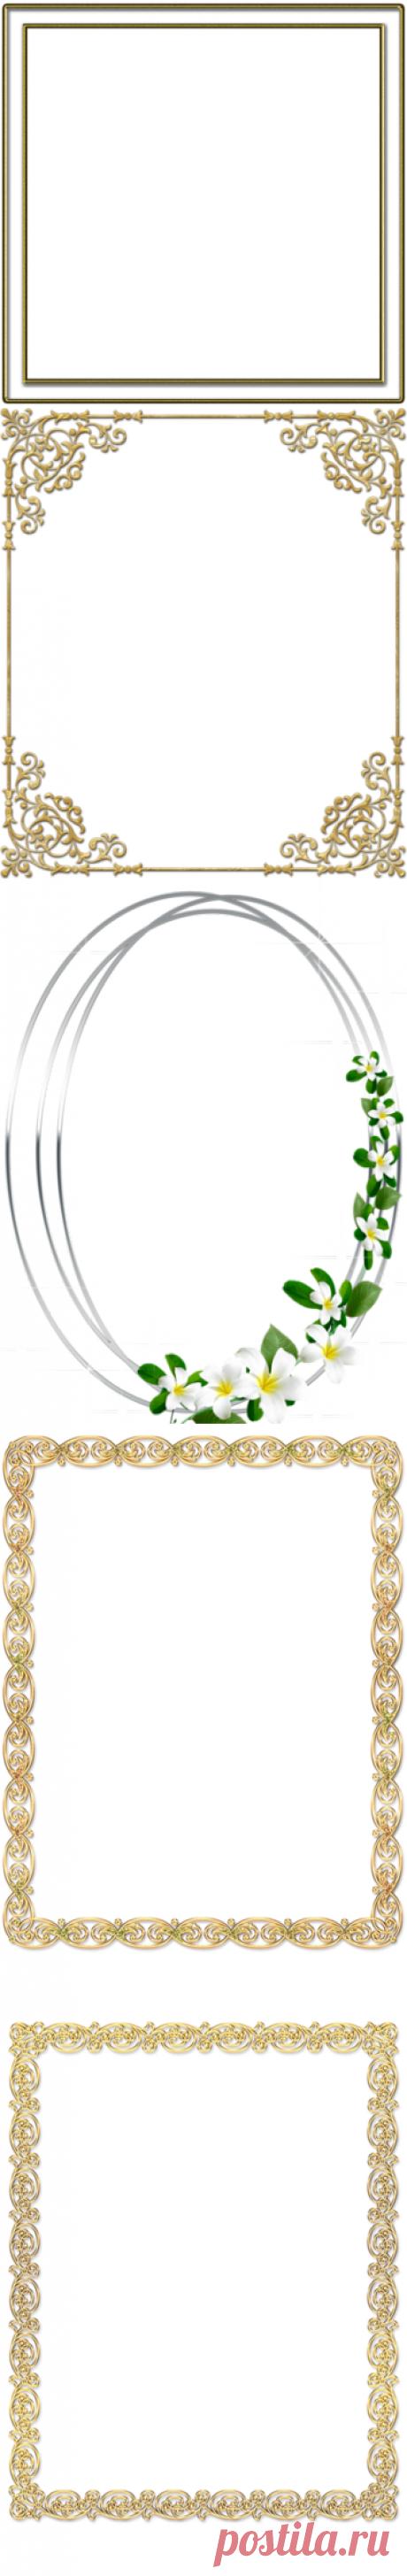 Золотые рамки - Рамки по цветам - Кира-скрап - клипарт и рамки на прозрачном фоне